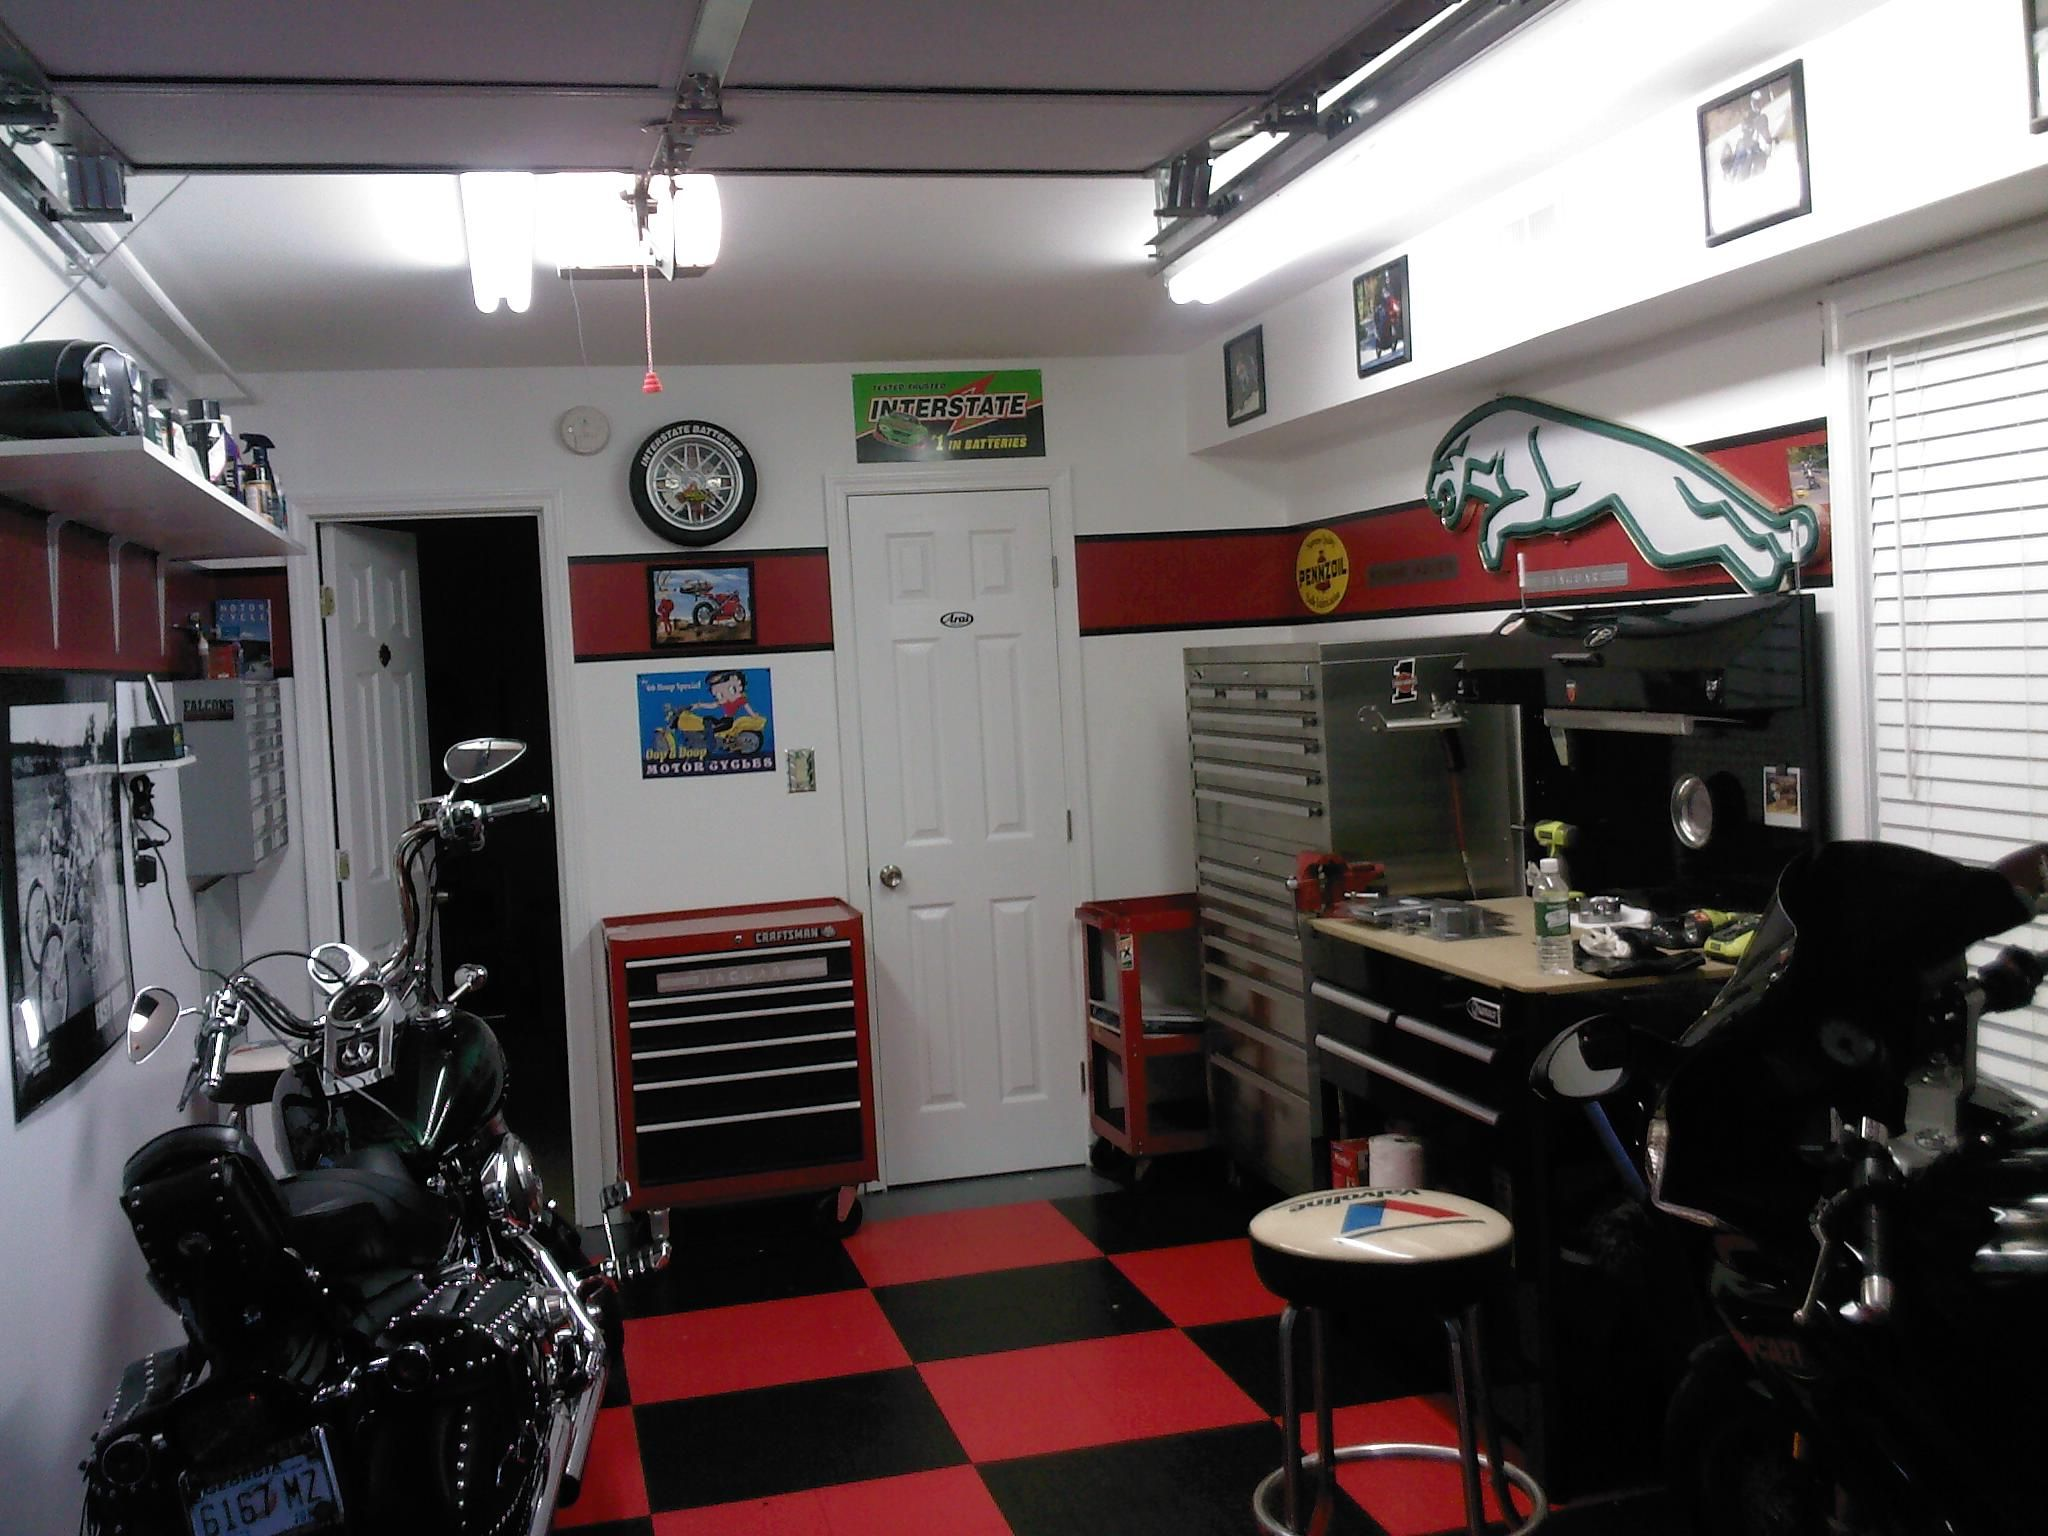 Man Cave Garage Journal : 1 car garage workshop ideas google search man cave